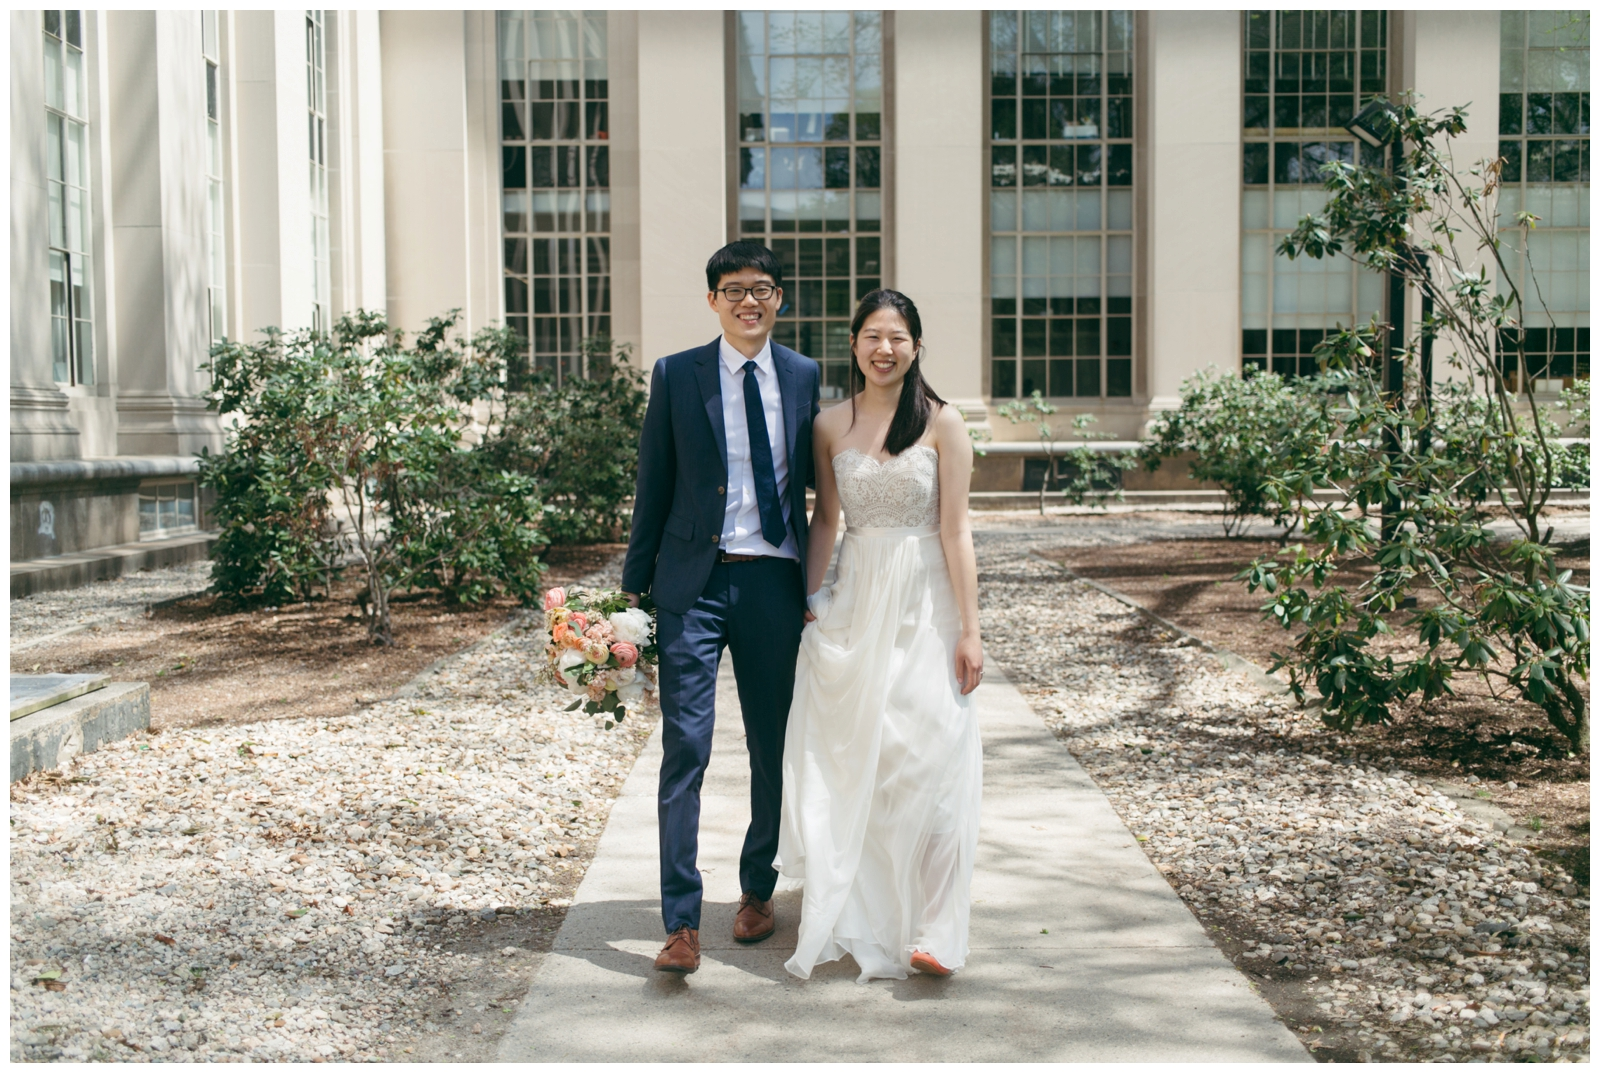 Samberg-Conference-Center-Boston-Wedding-Photographer-Bailey-Q-Photo-080.jpg